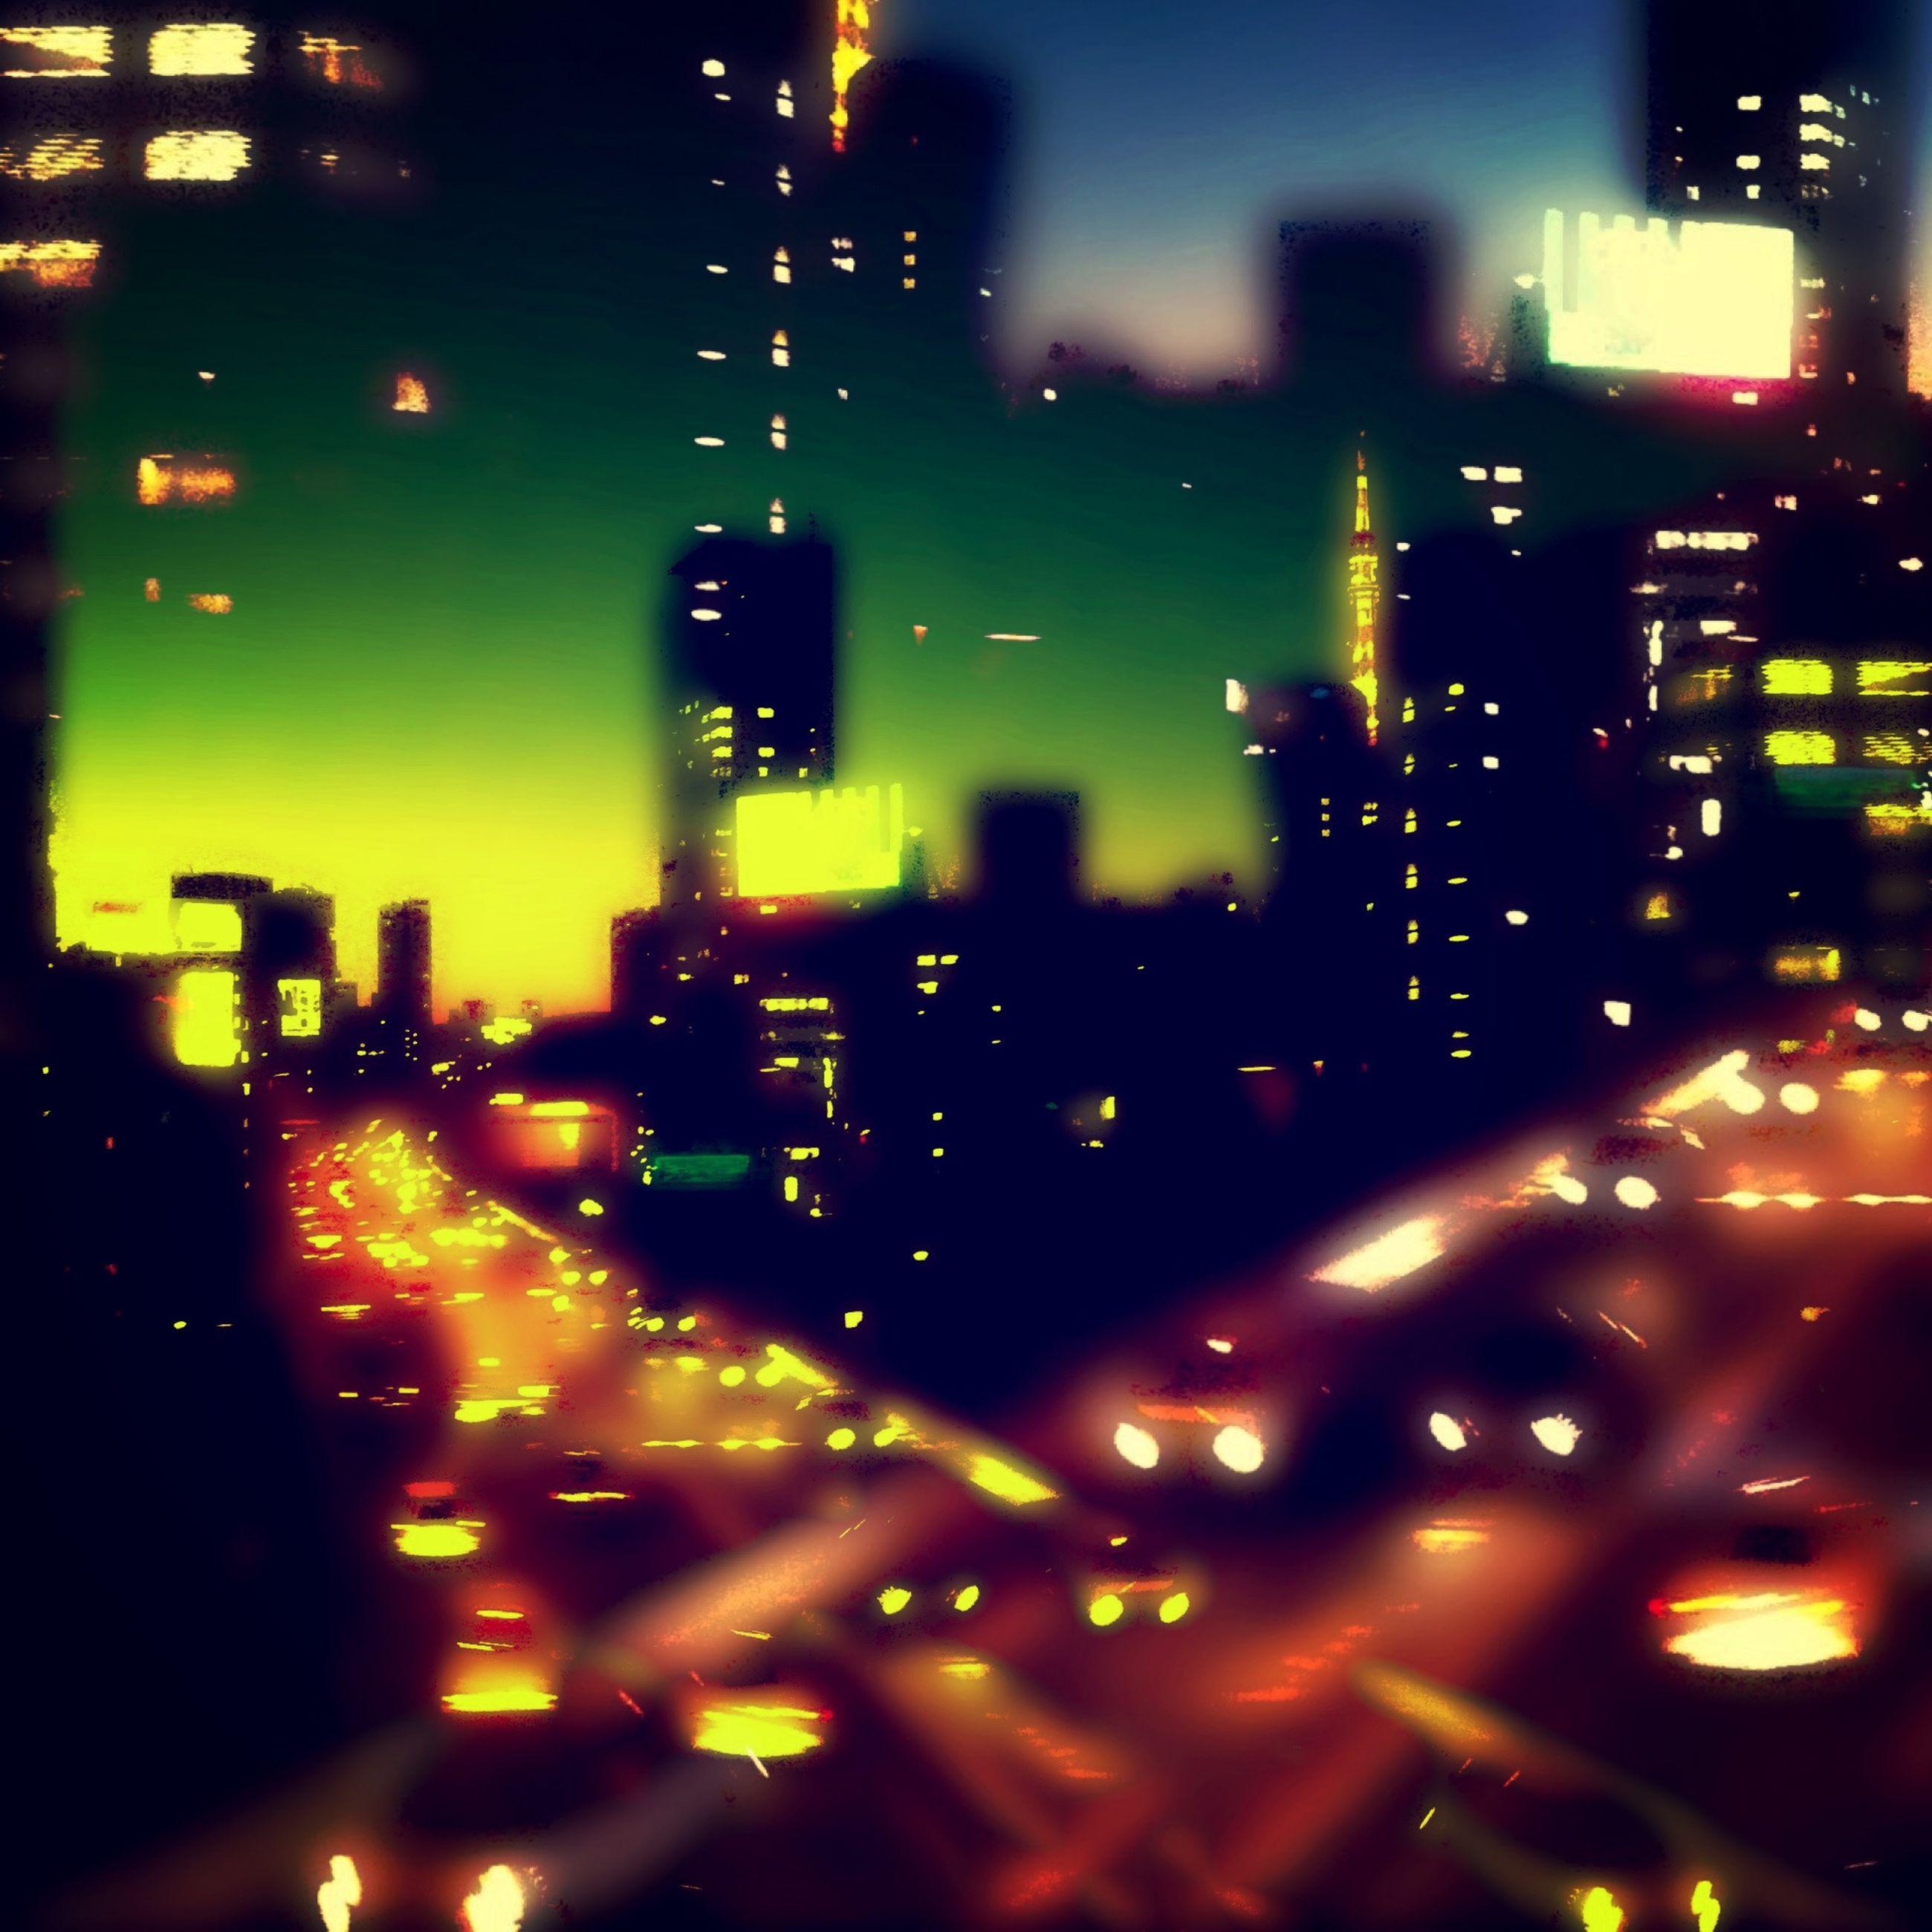 illuminated, night, city, building exterior, architecture, built structure, cityscape, skyscraper, street, city life, city street, road, office building, wet, window, light - natural phenomenon, transportation, no people, glass - material, defocused